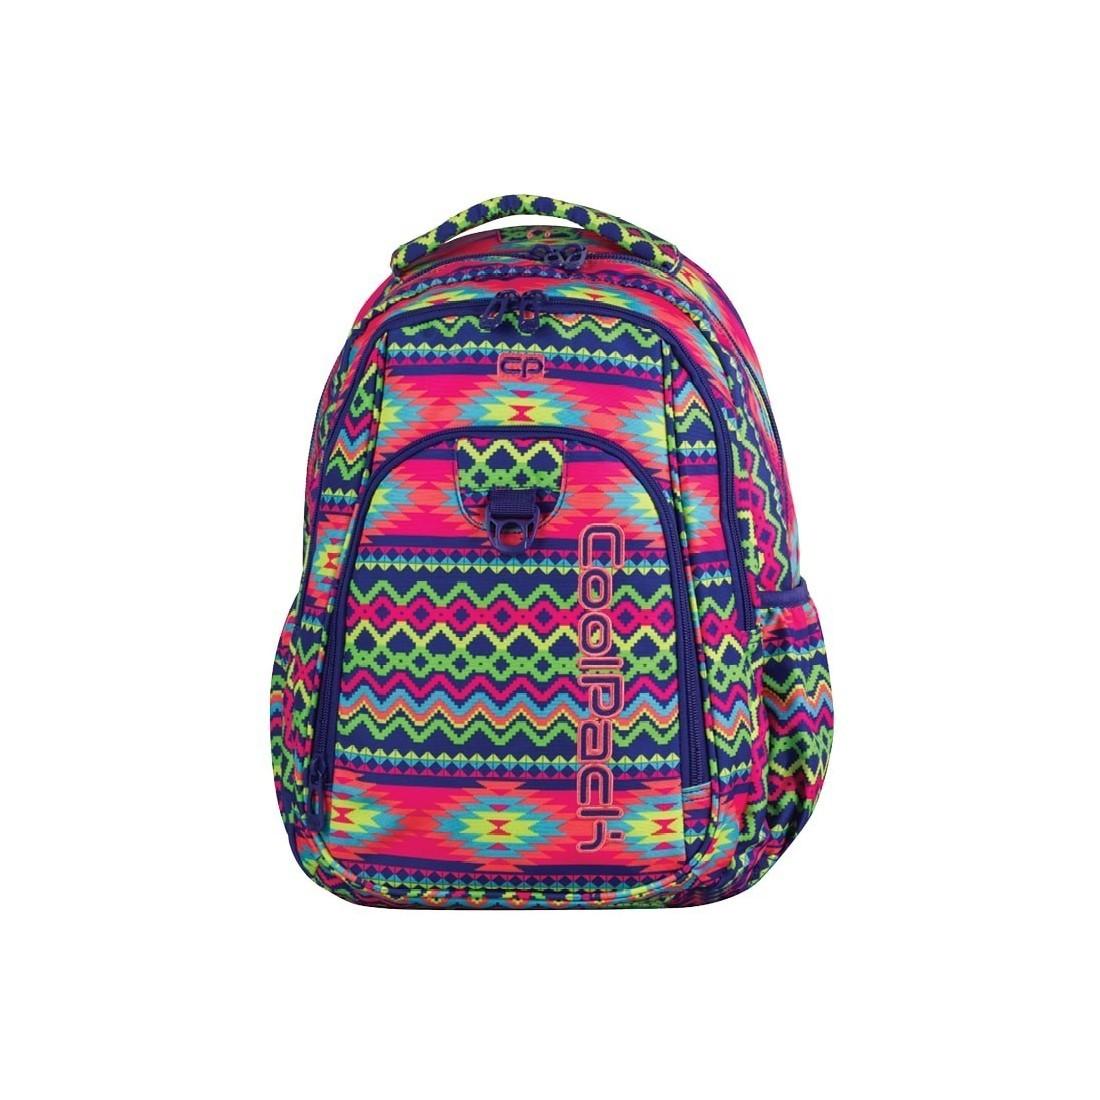 fc5cbbd20e498 Plecak młodzieżowy CoolPack CP STRIKE BOHO ELECTRA 781 Aztec Boho